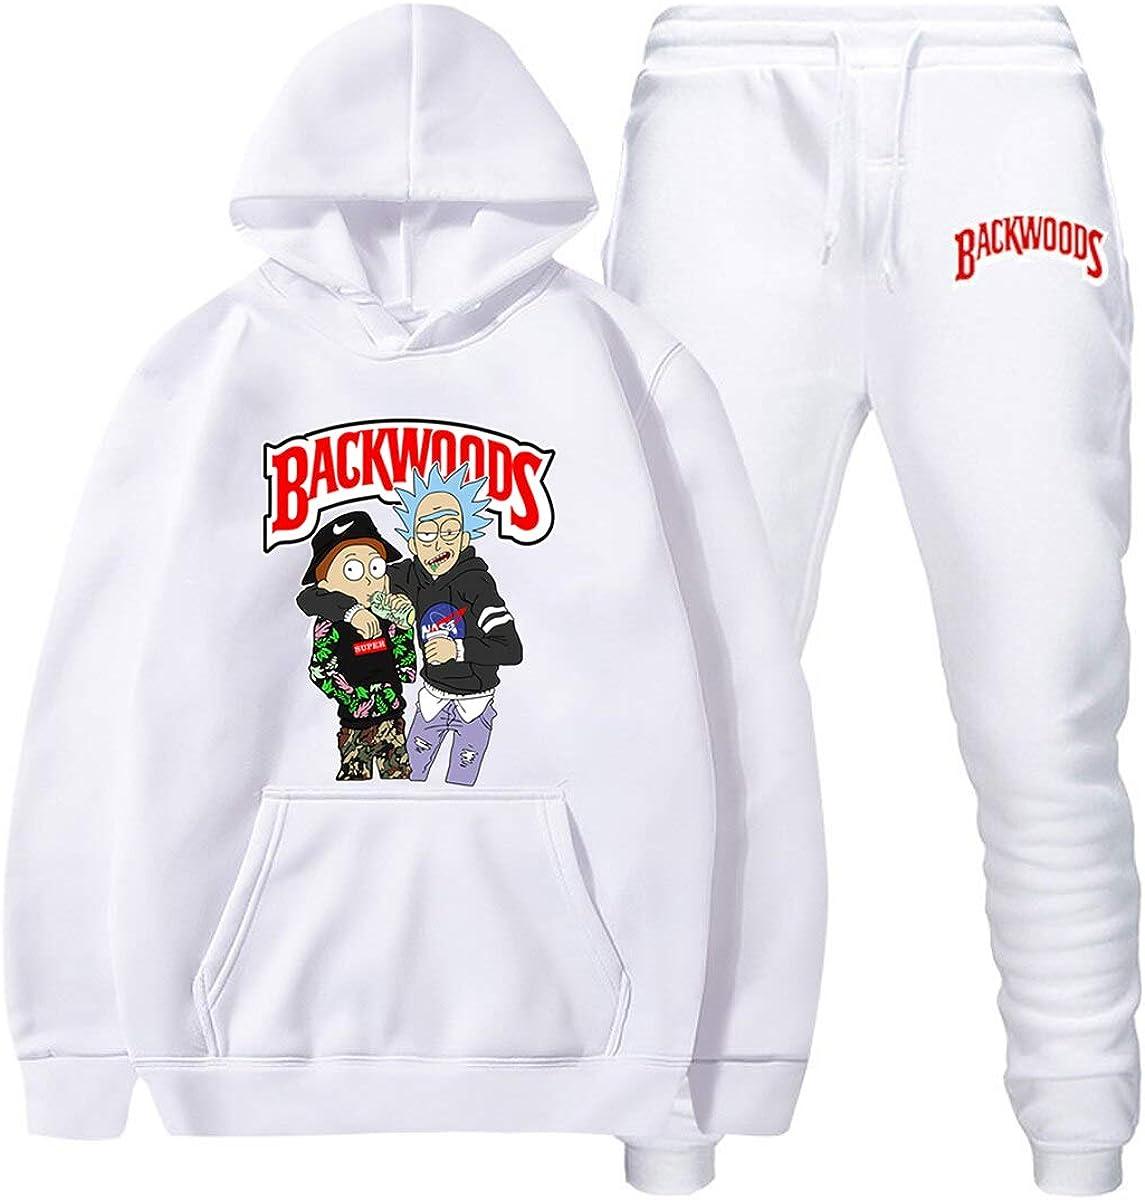 DISINIBITA Backwoods Hoodies and Pants Fashion Causal Sport Suit for Men Women